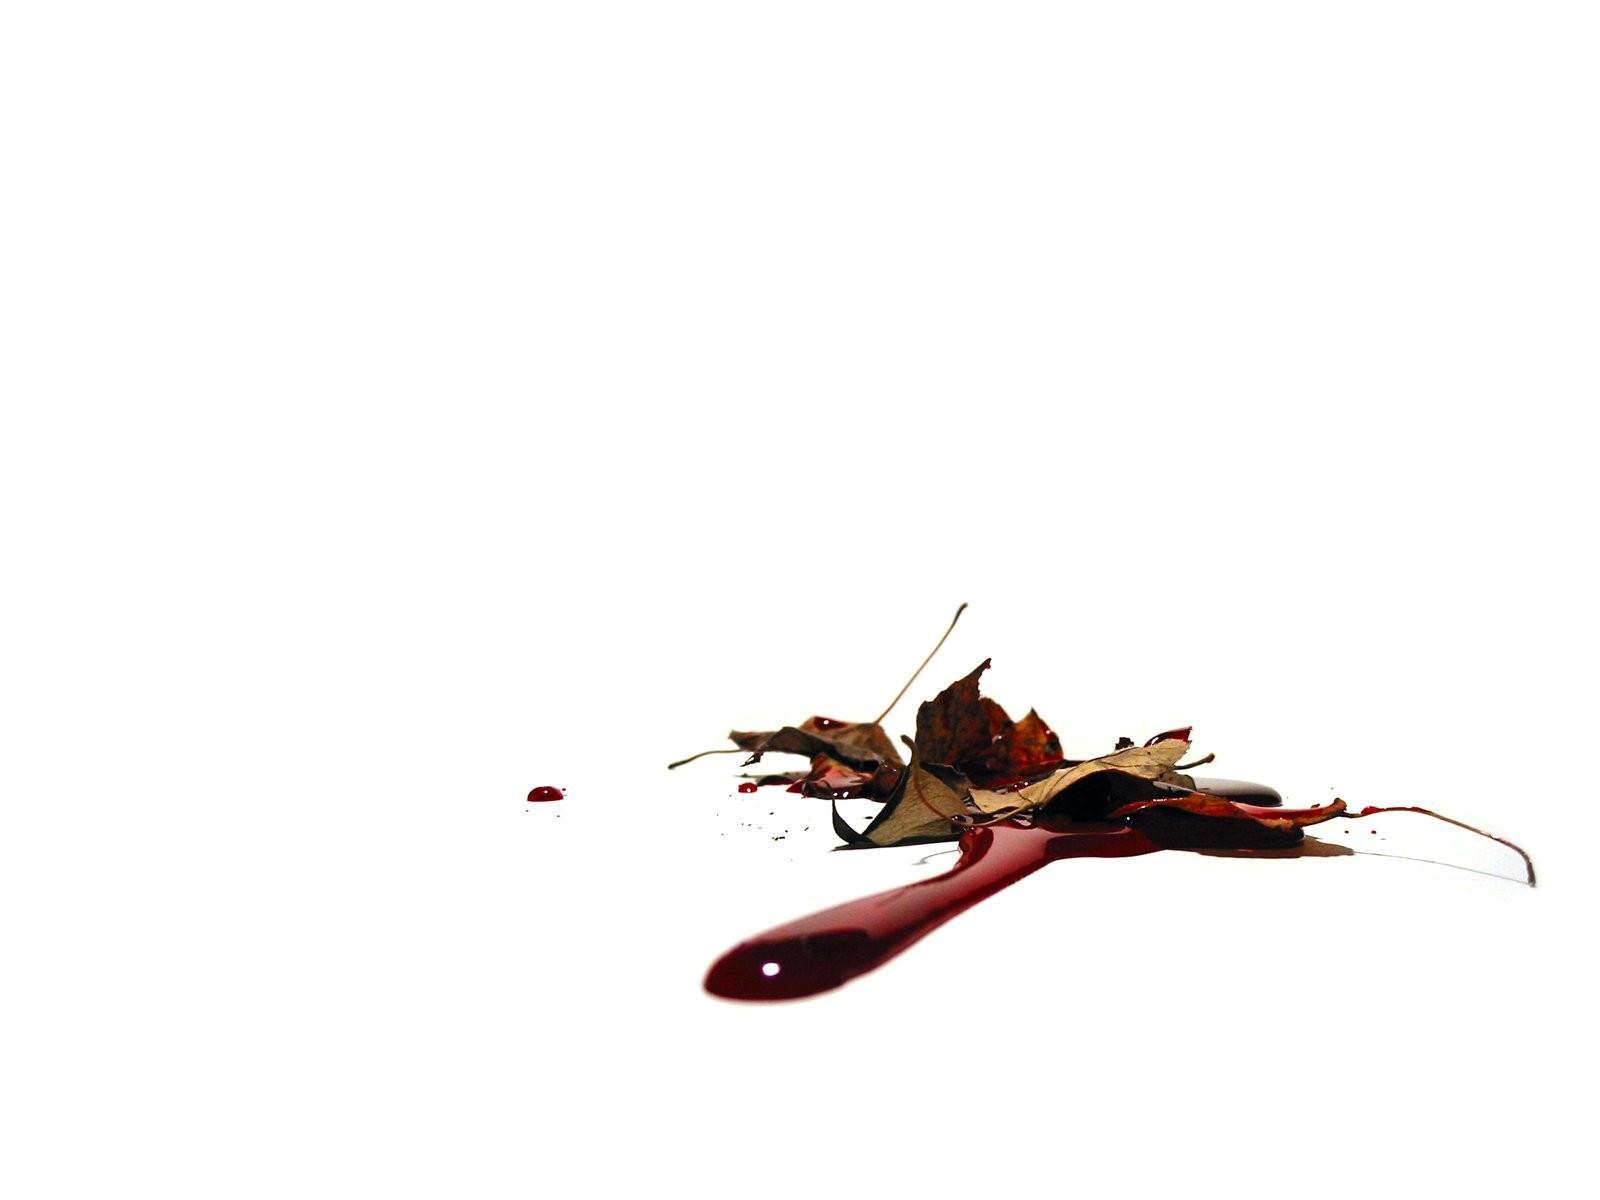 Капли крови под листьями